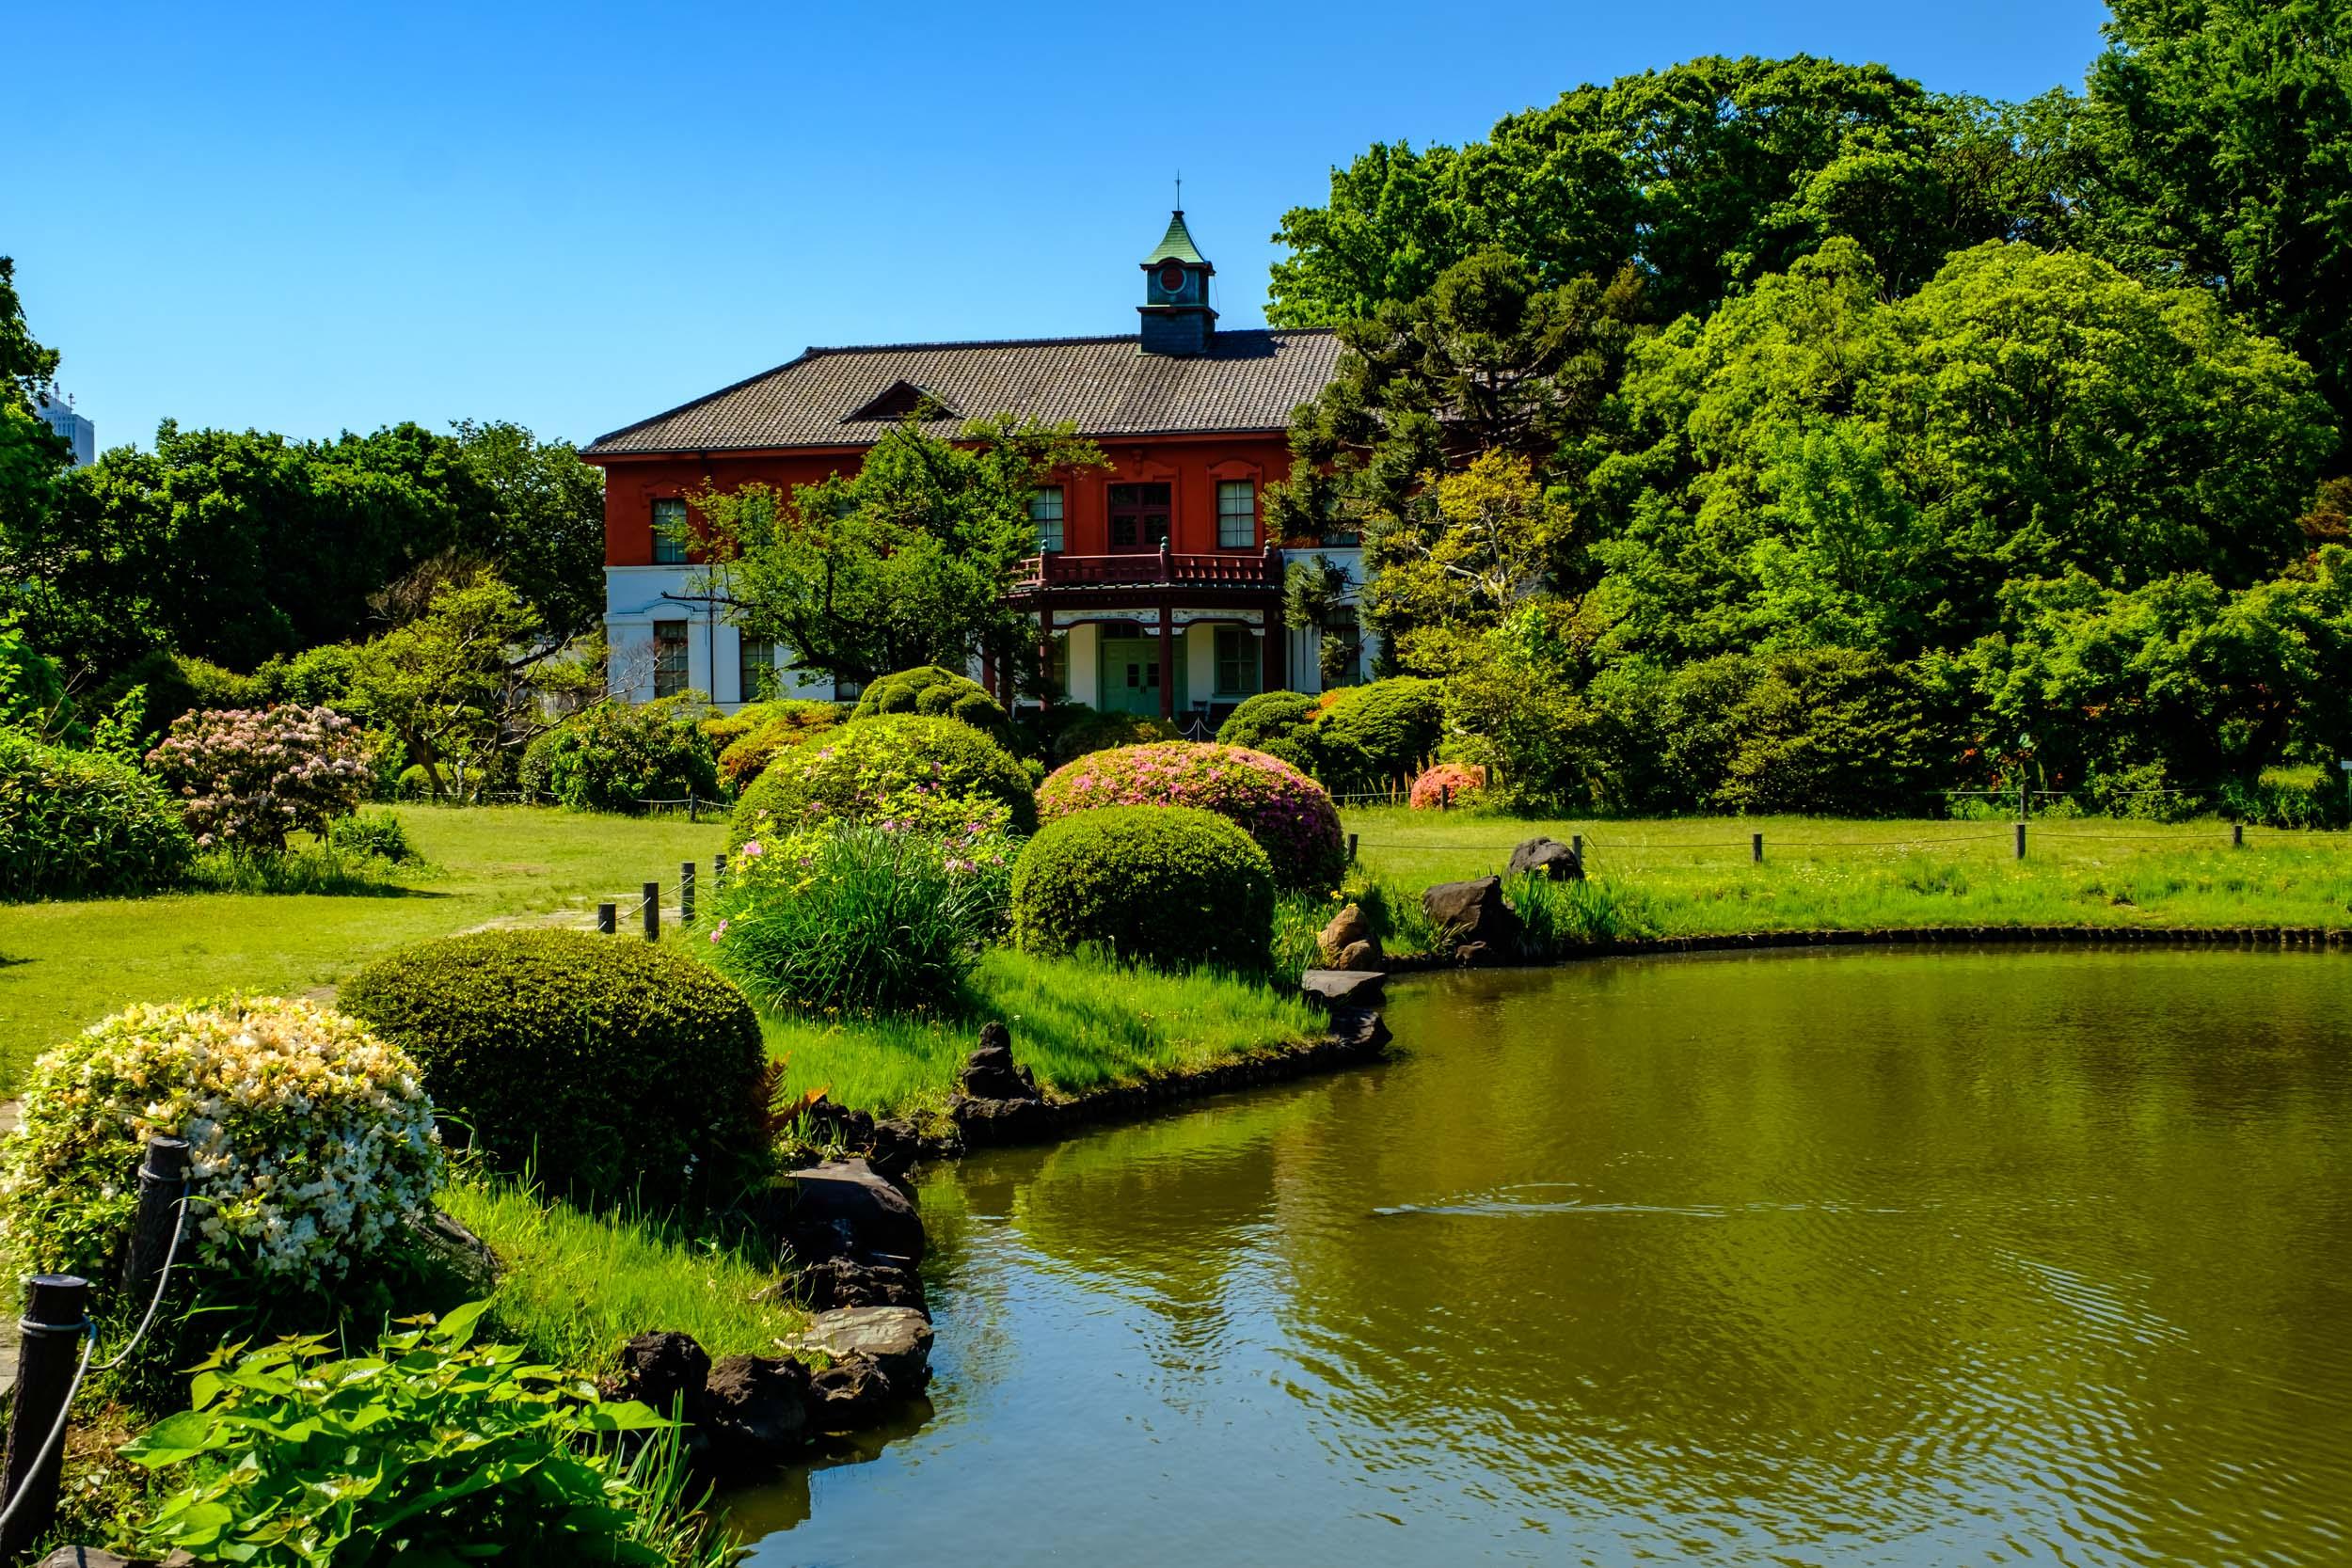 Looking towards the old Tokyo School of Medicine's headquarters